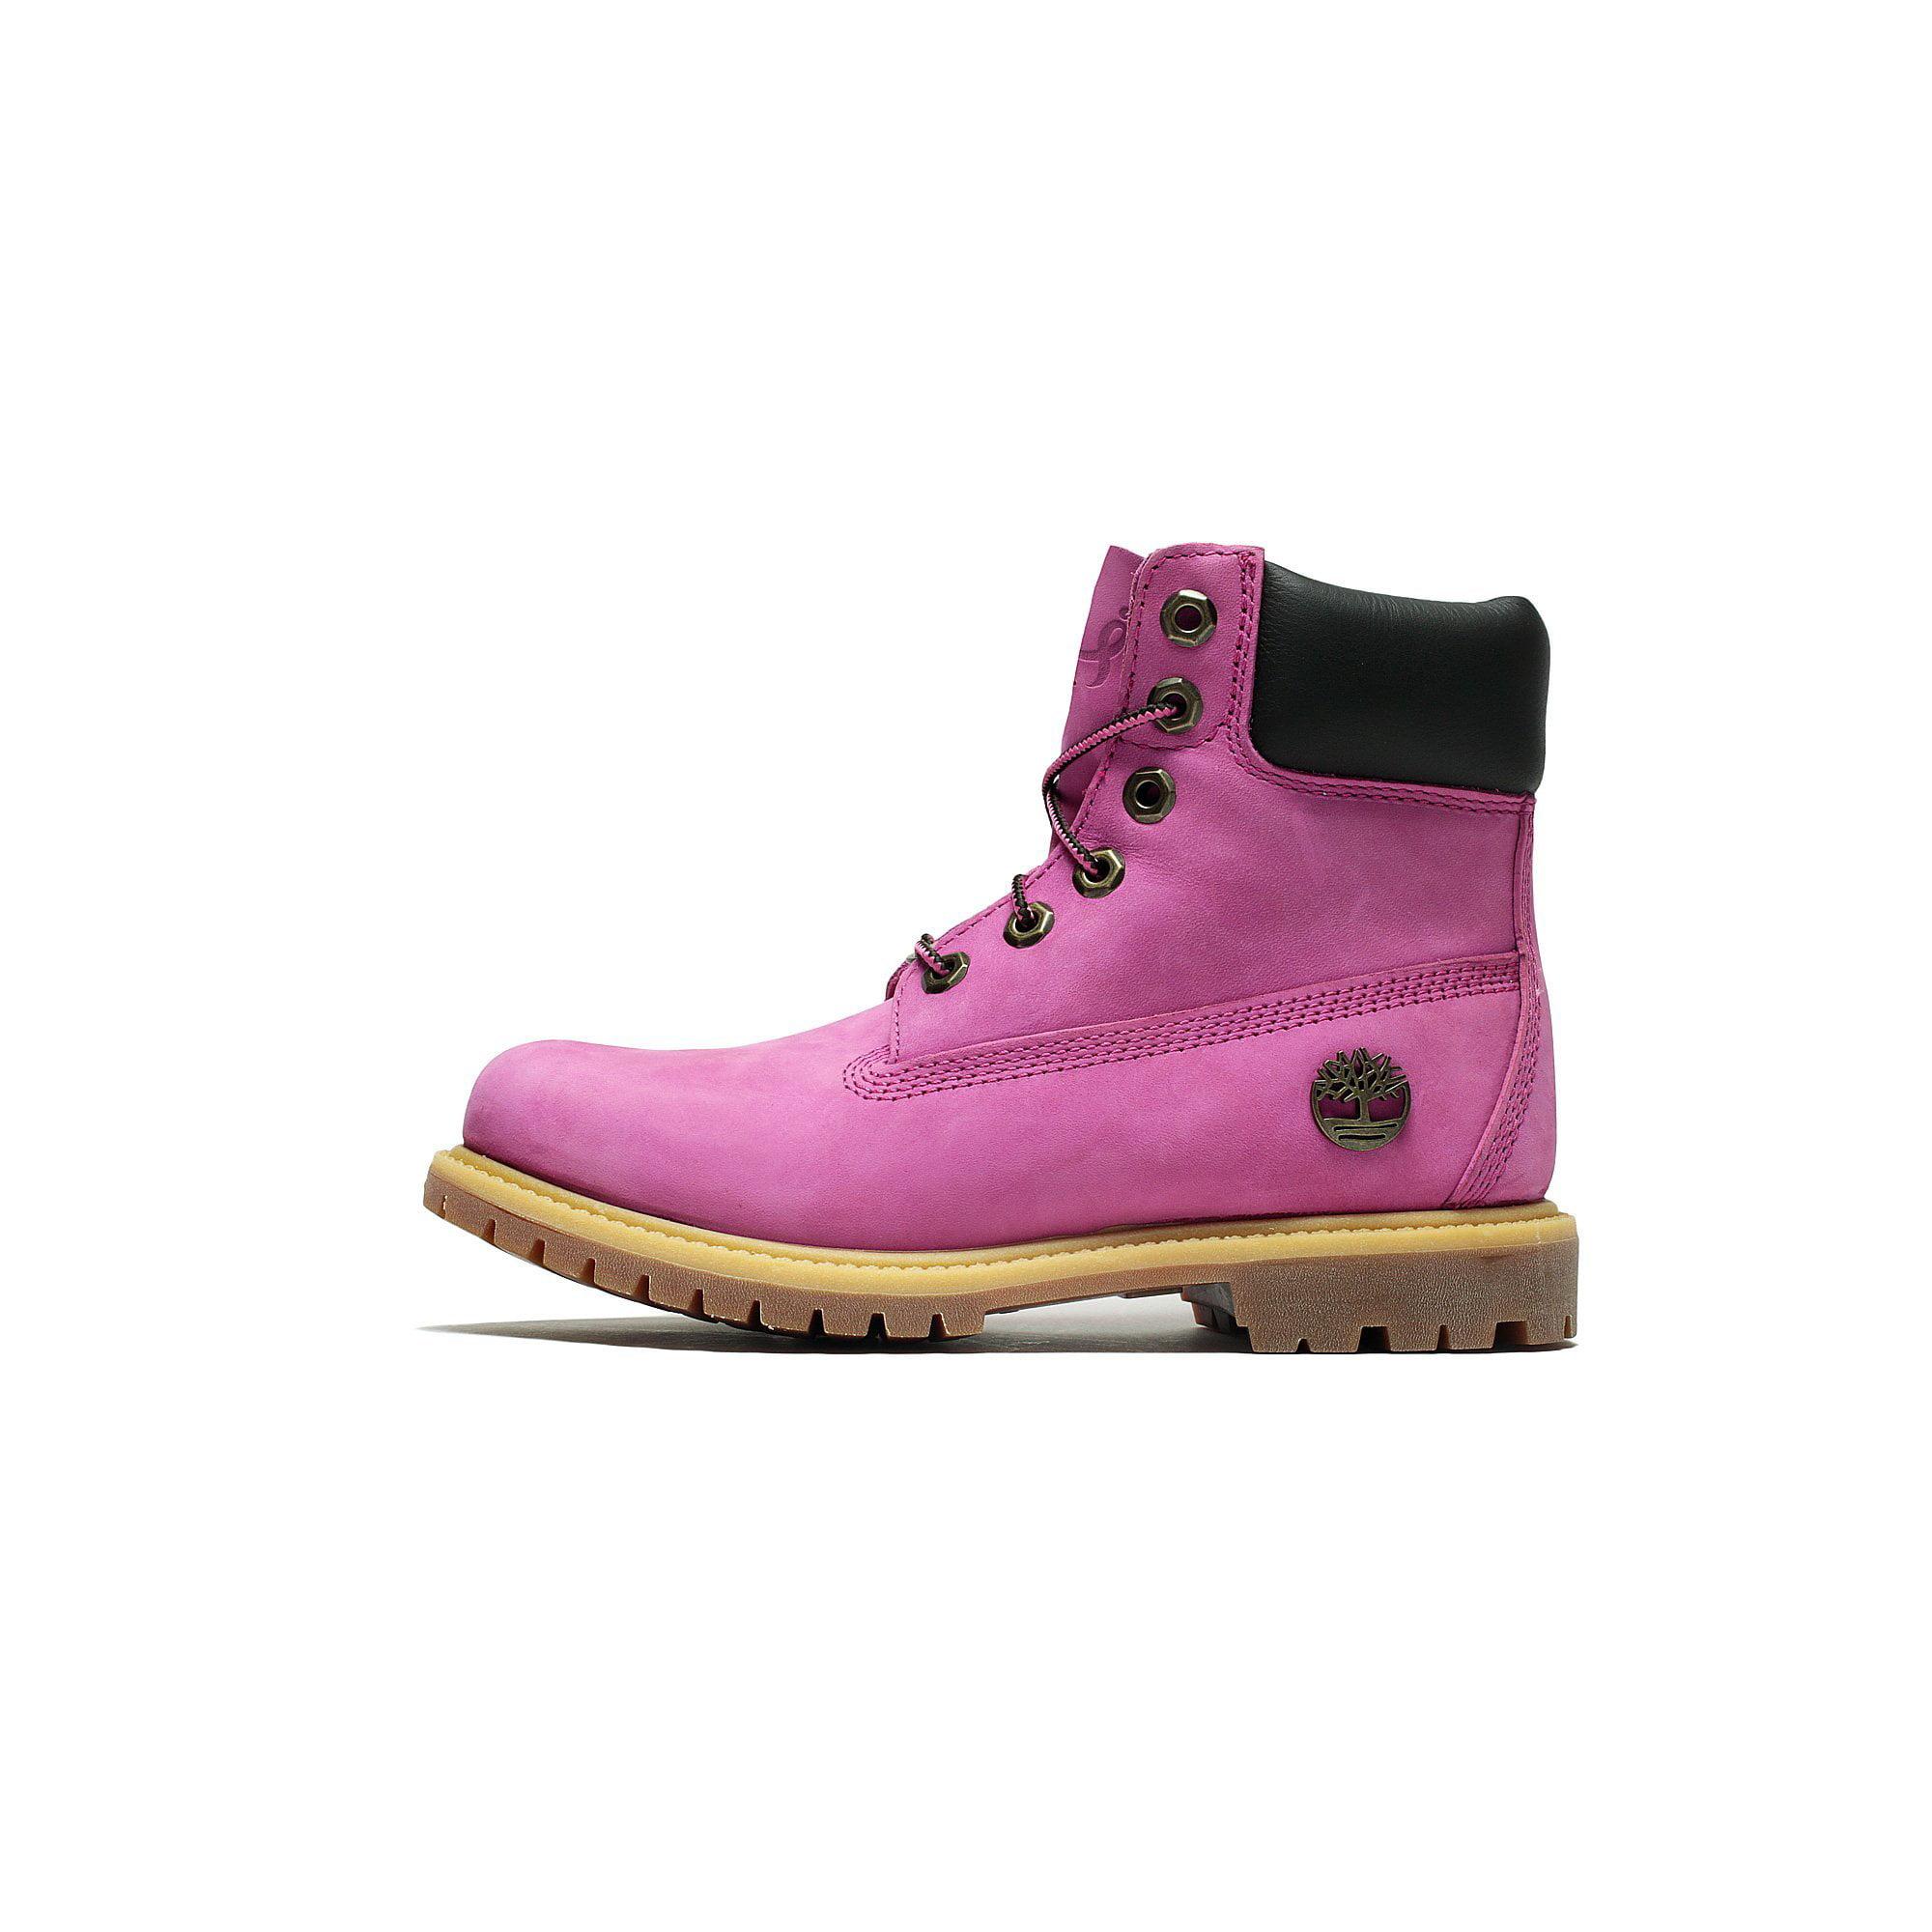 Womens Timberland 6 Inch Waterproof Boot Susan G Komen Pink TB0A1KHI by